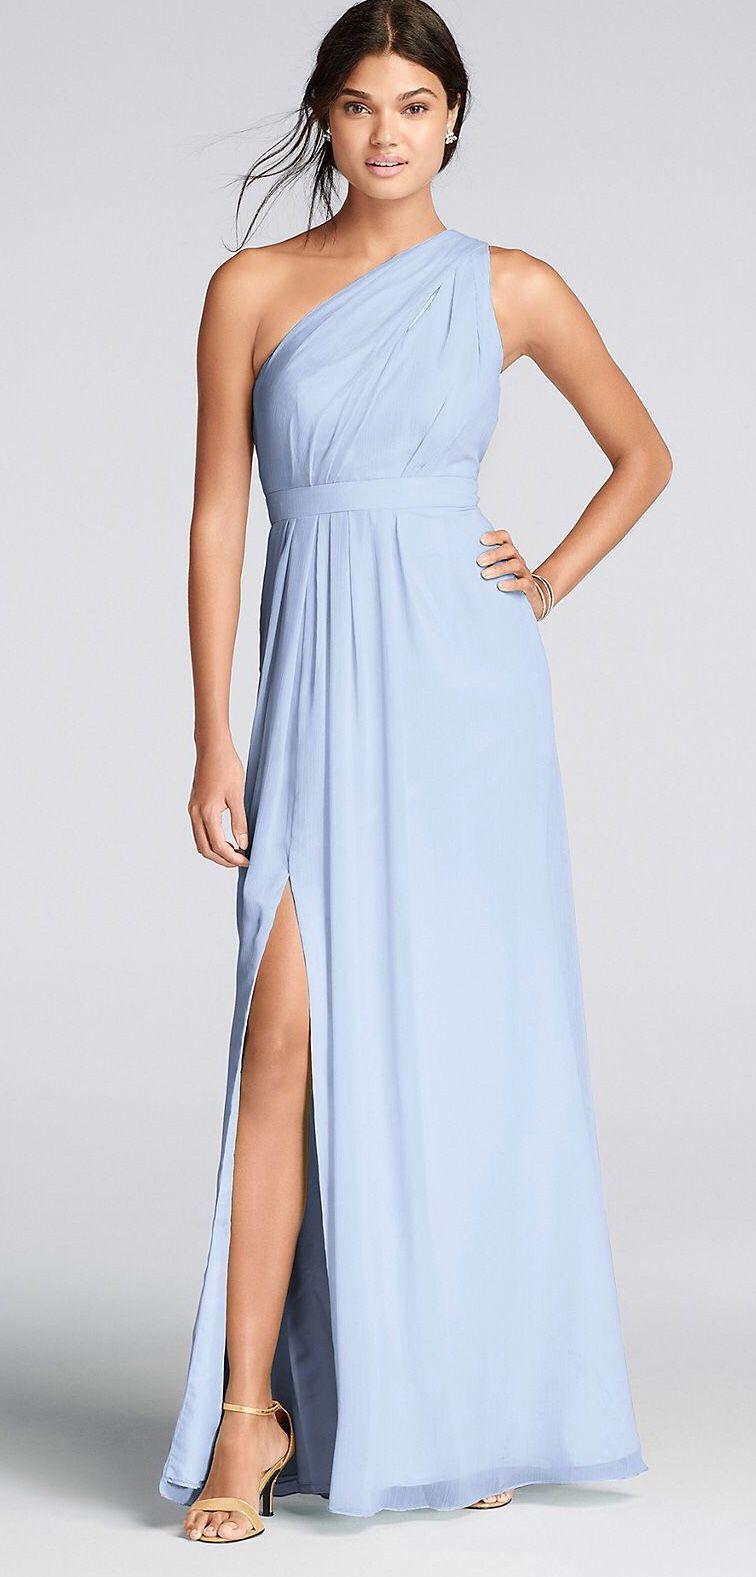 David's Bridal Long one shoulder dress